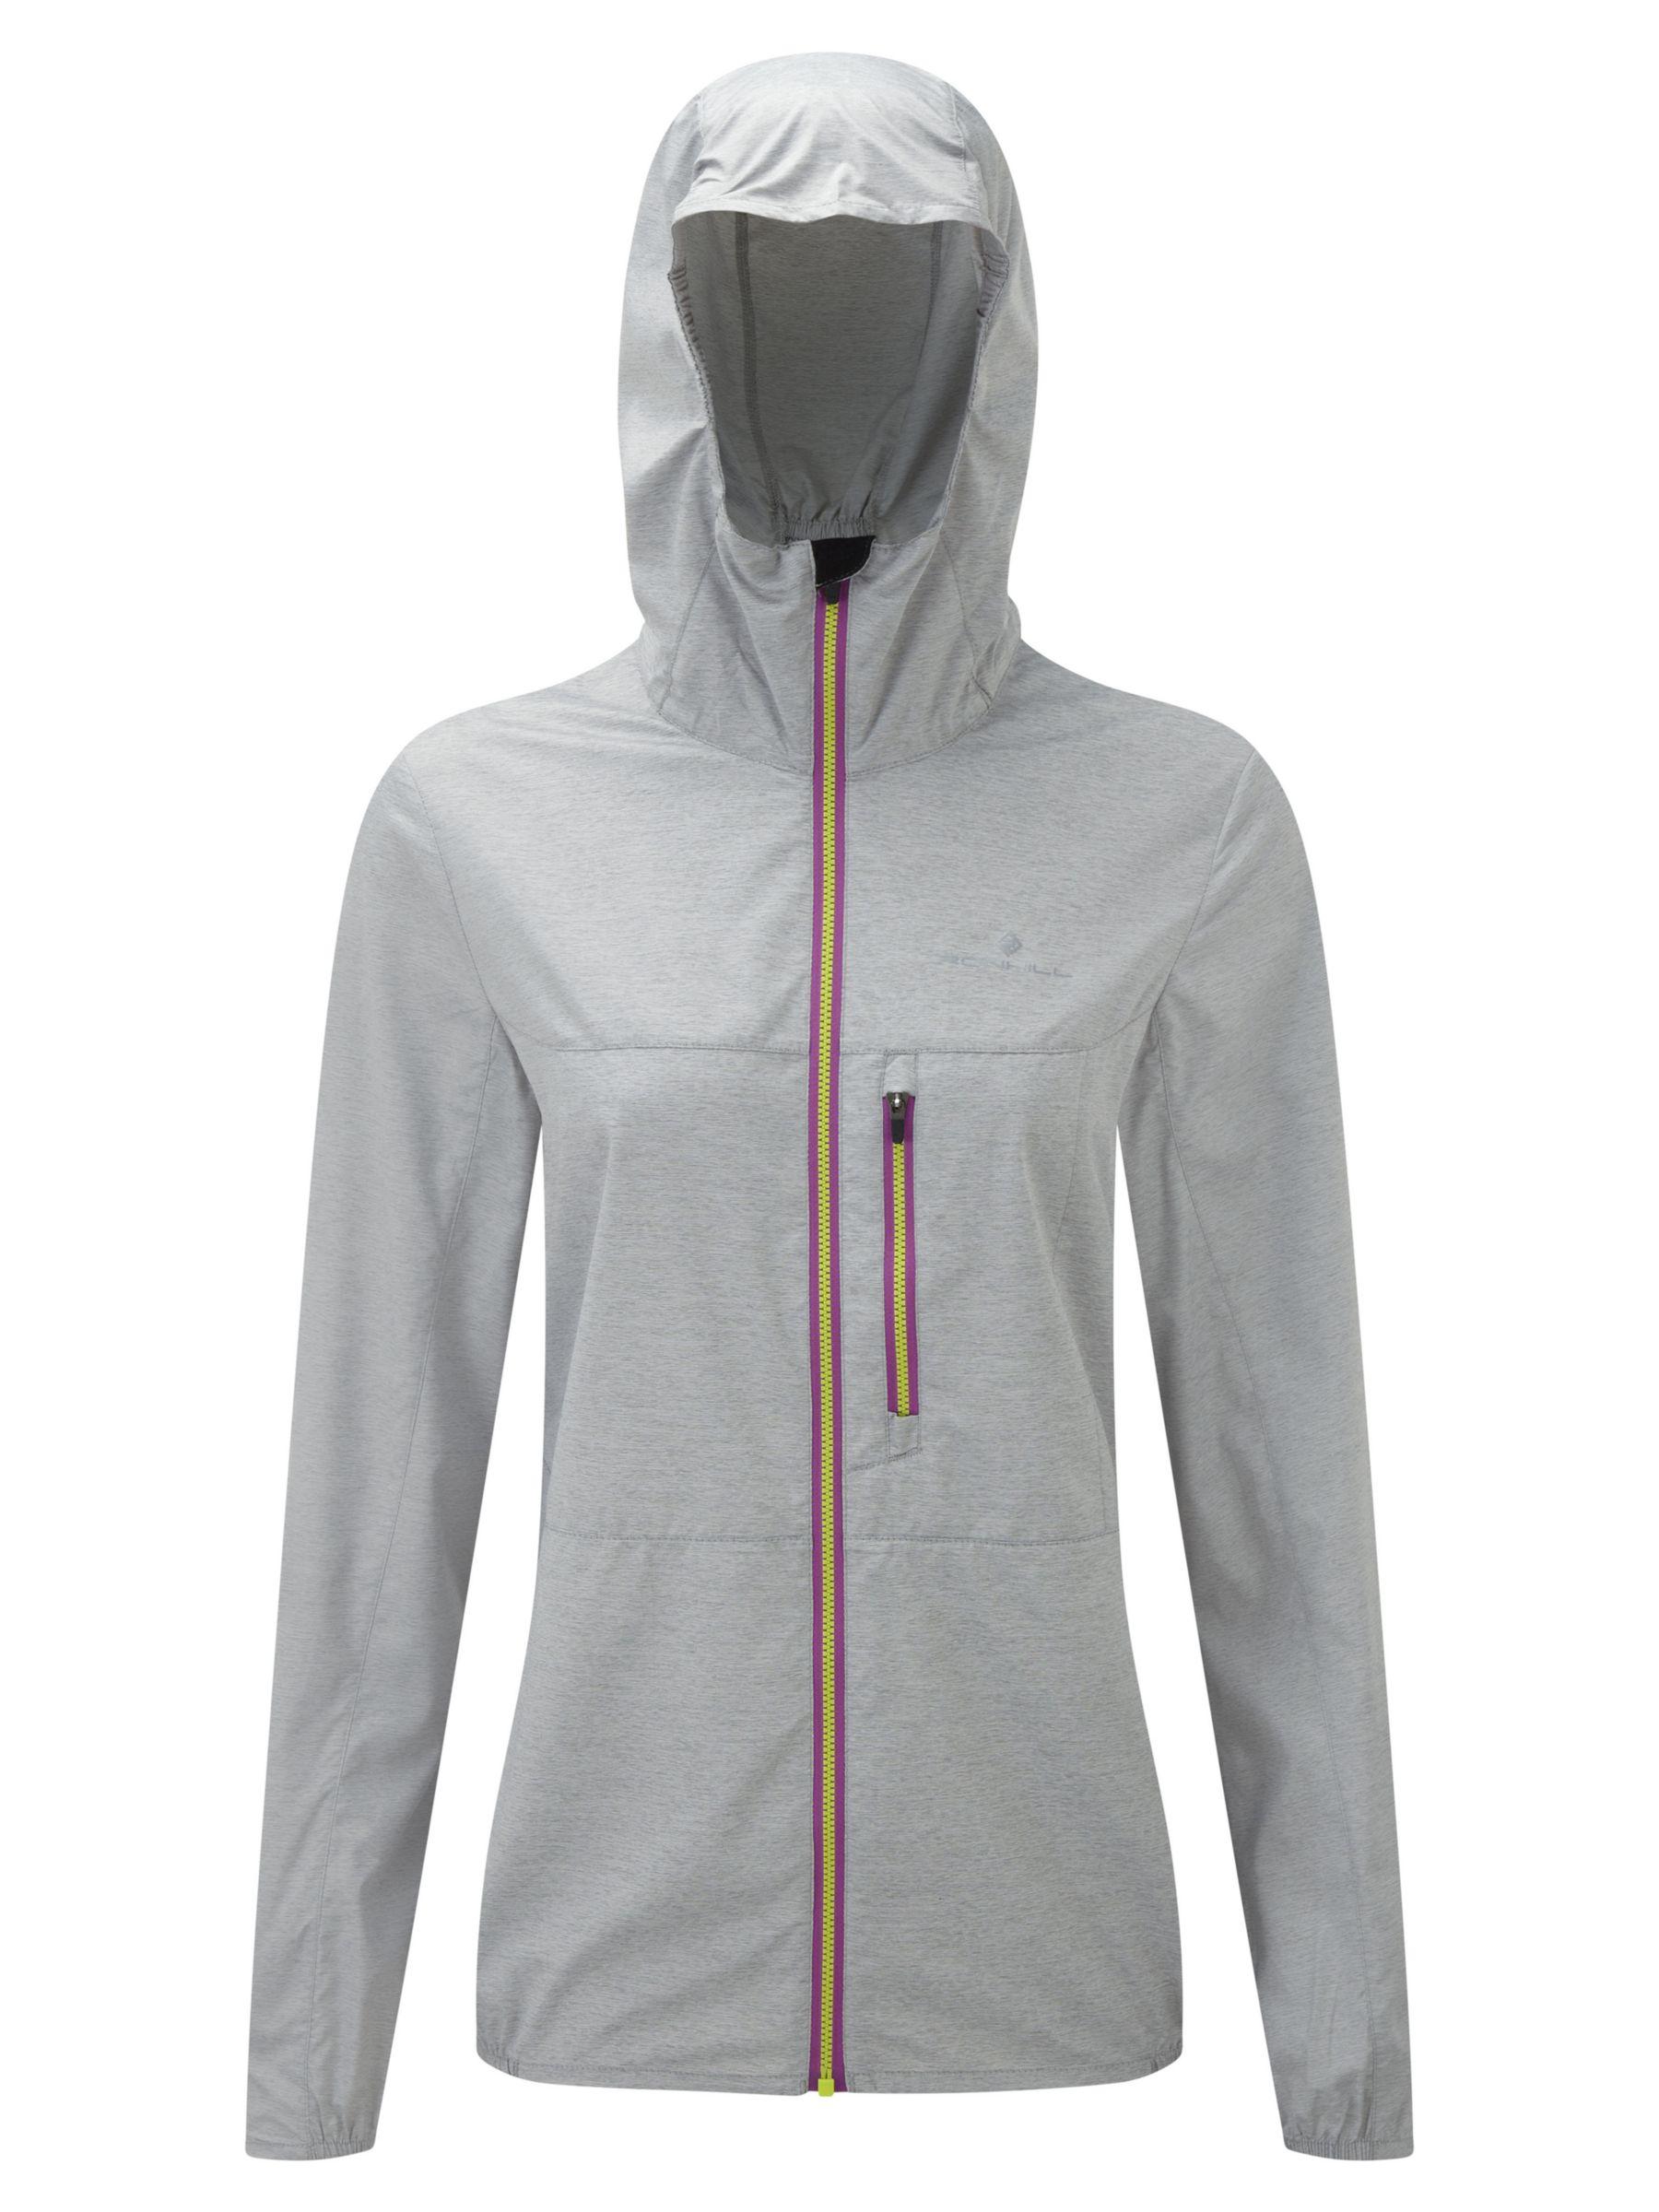 Ronhill Ronhill Momentum Windforce Women's Jacket, Grey